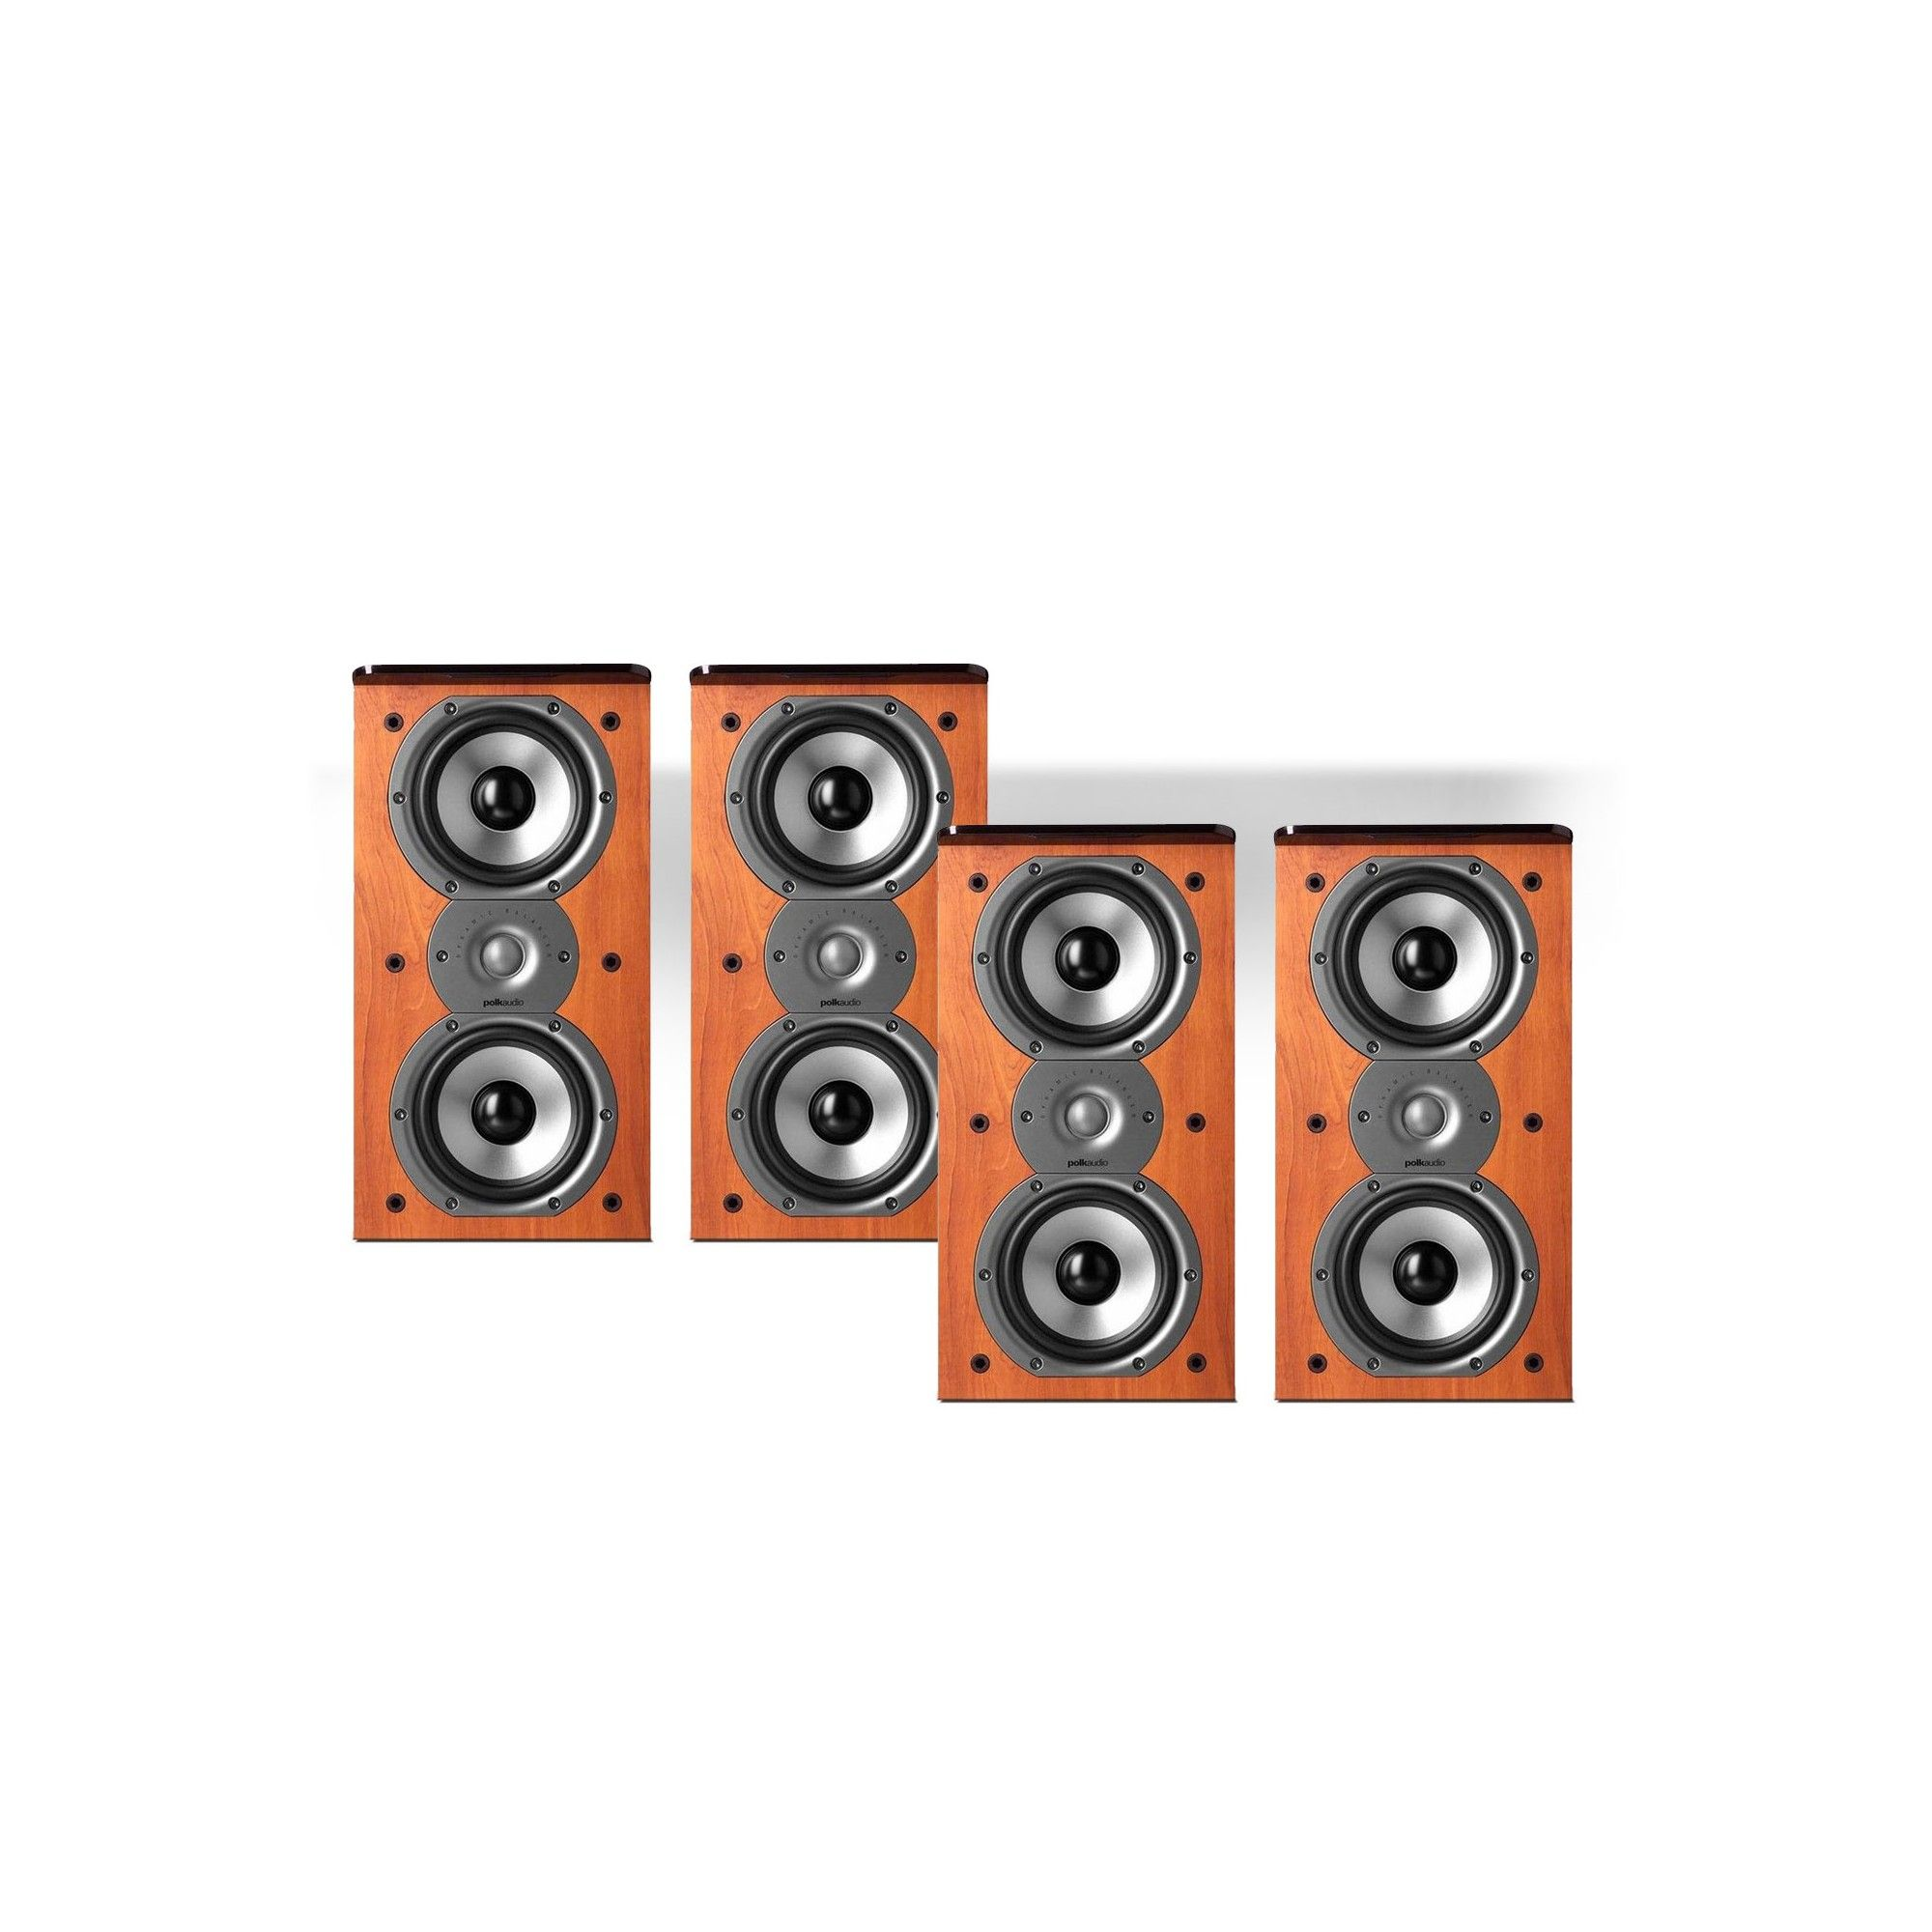 "Pair Polk Audio TSi200 2-Way Bookshelf Speakers with Dual 5-1//4/"" Drivers"